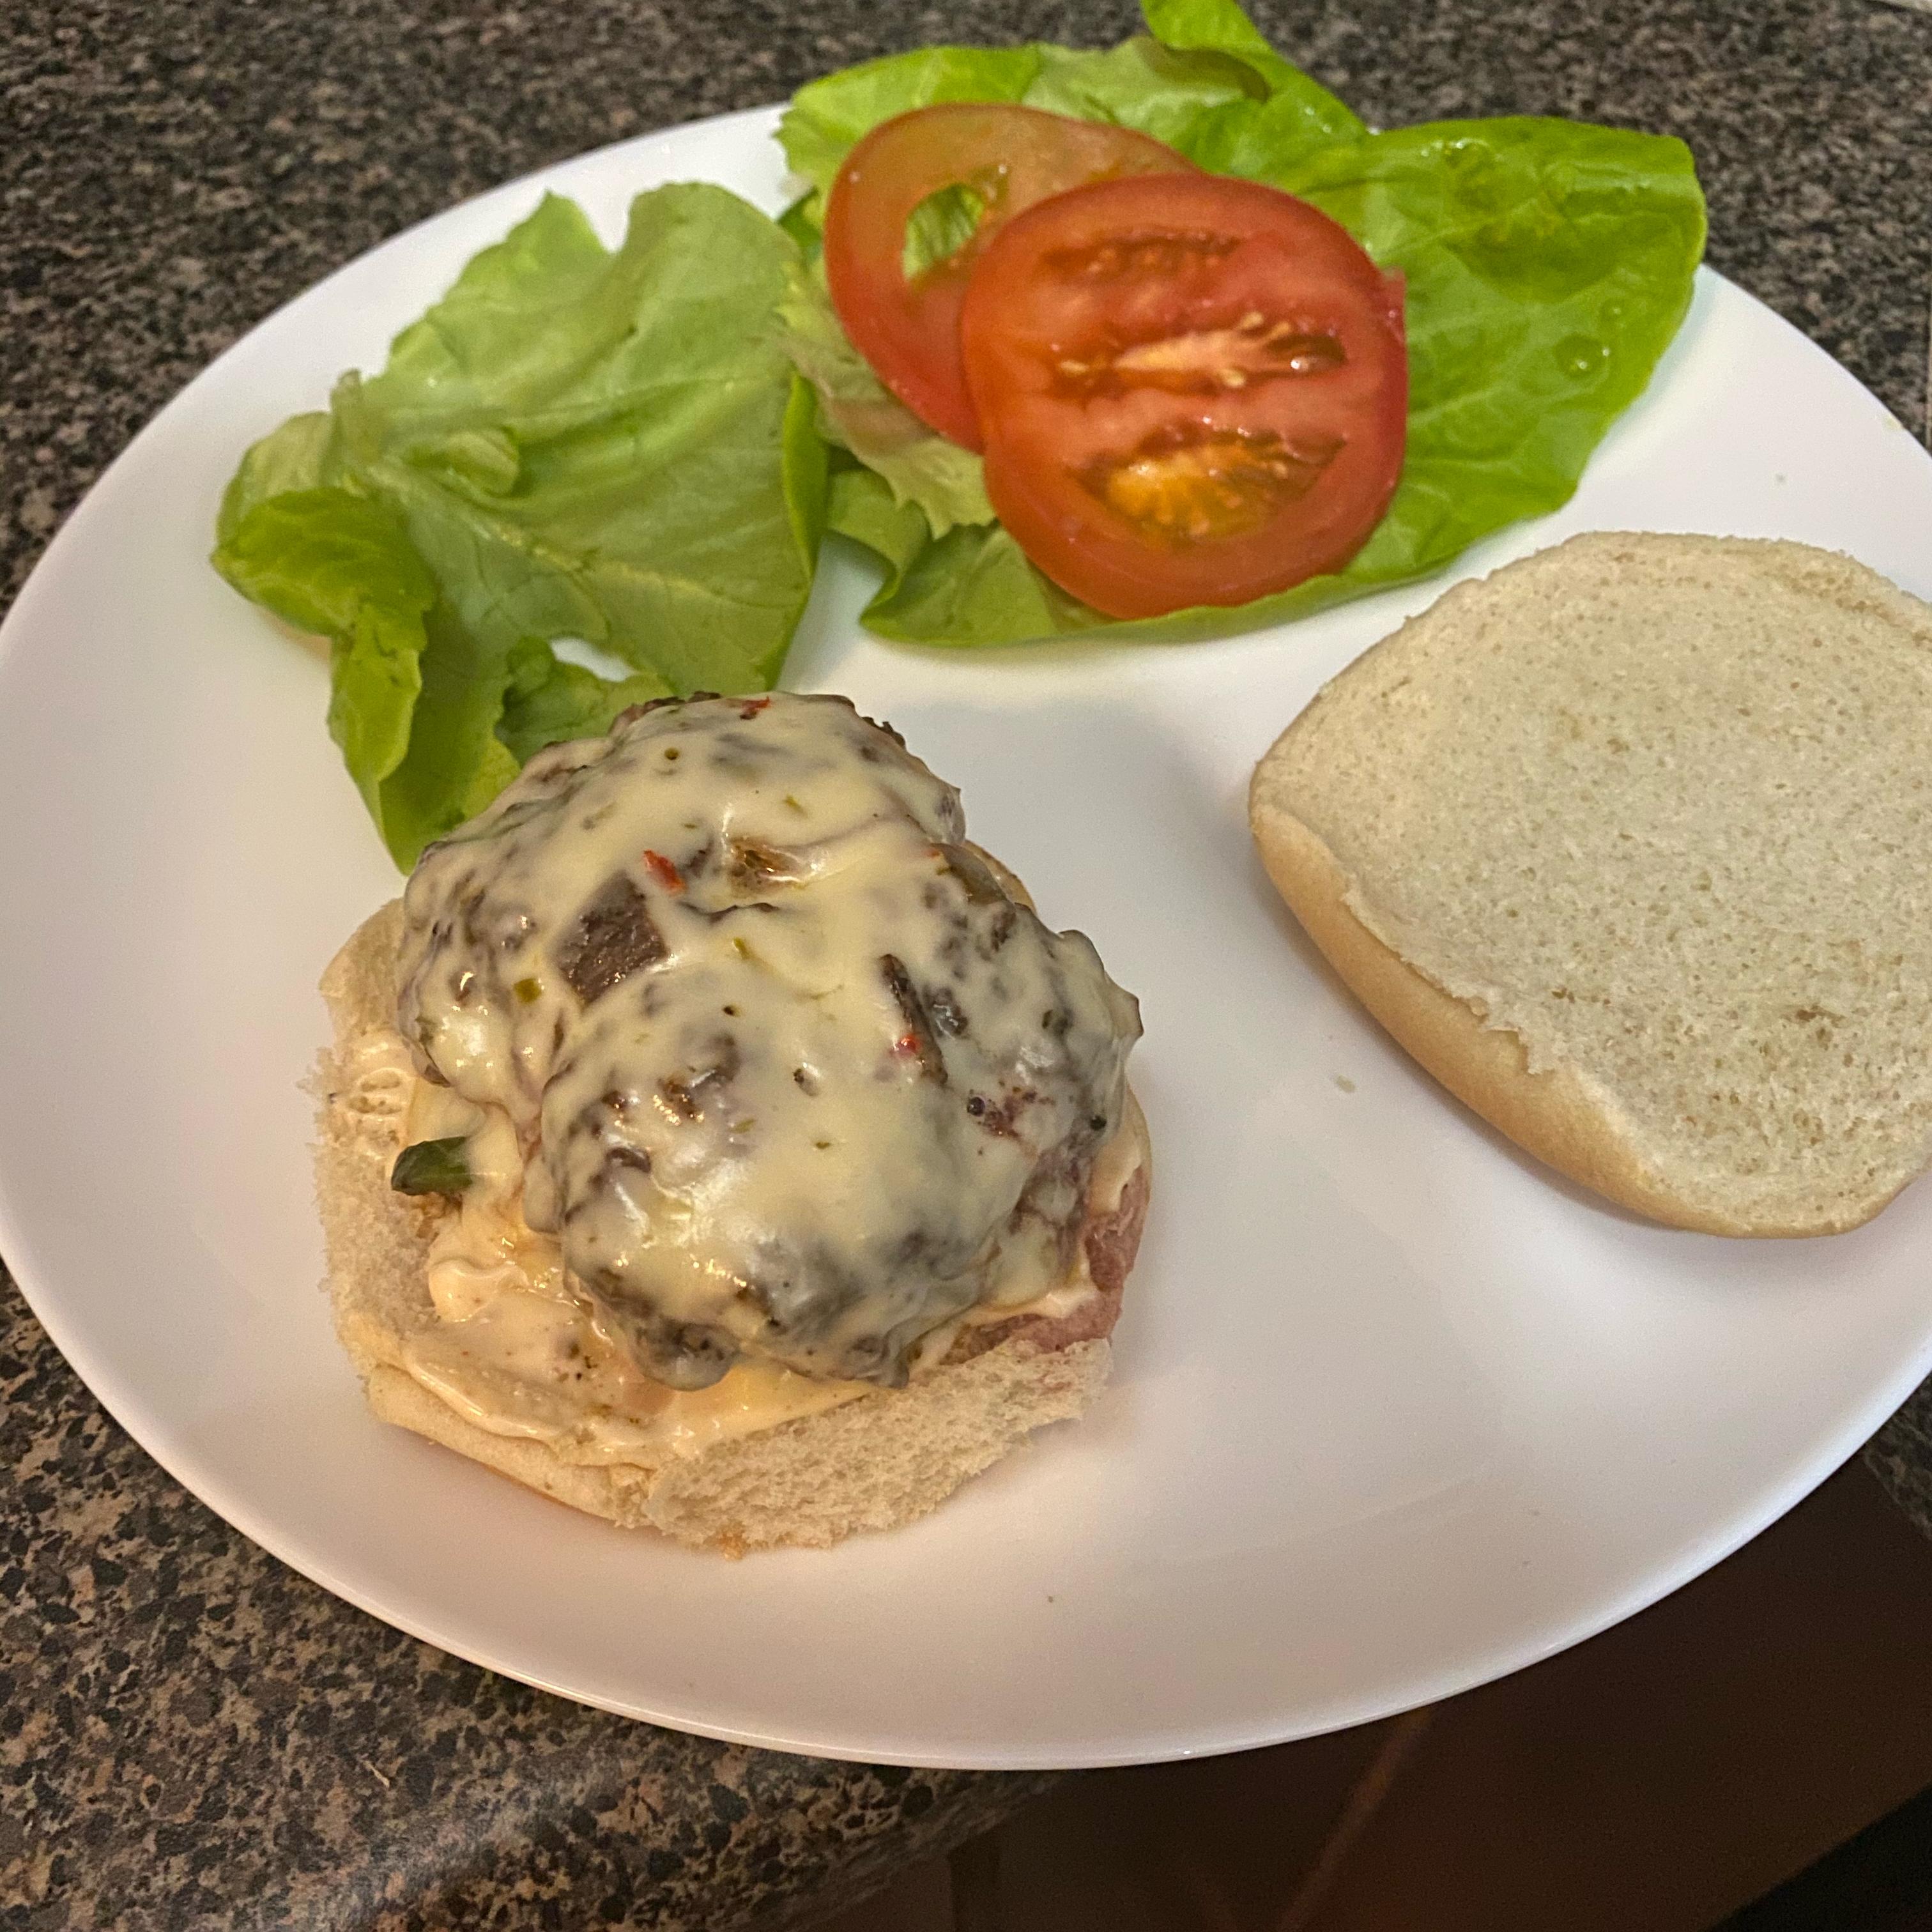 Tex-Mex Burger with Cajun Mayo